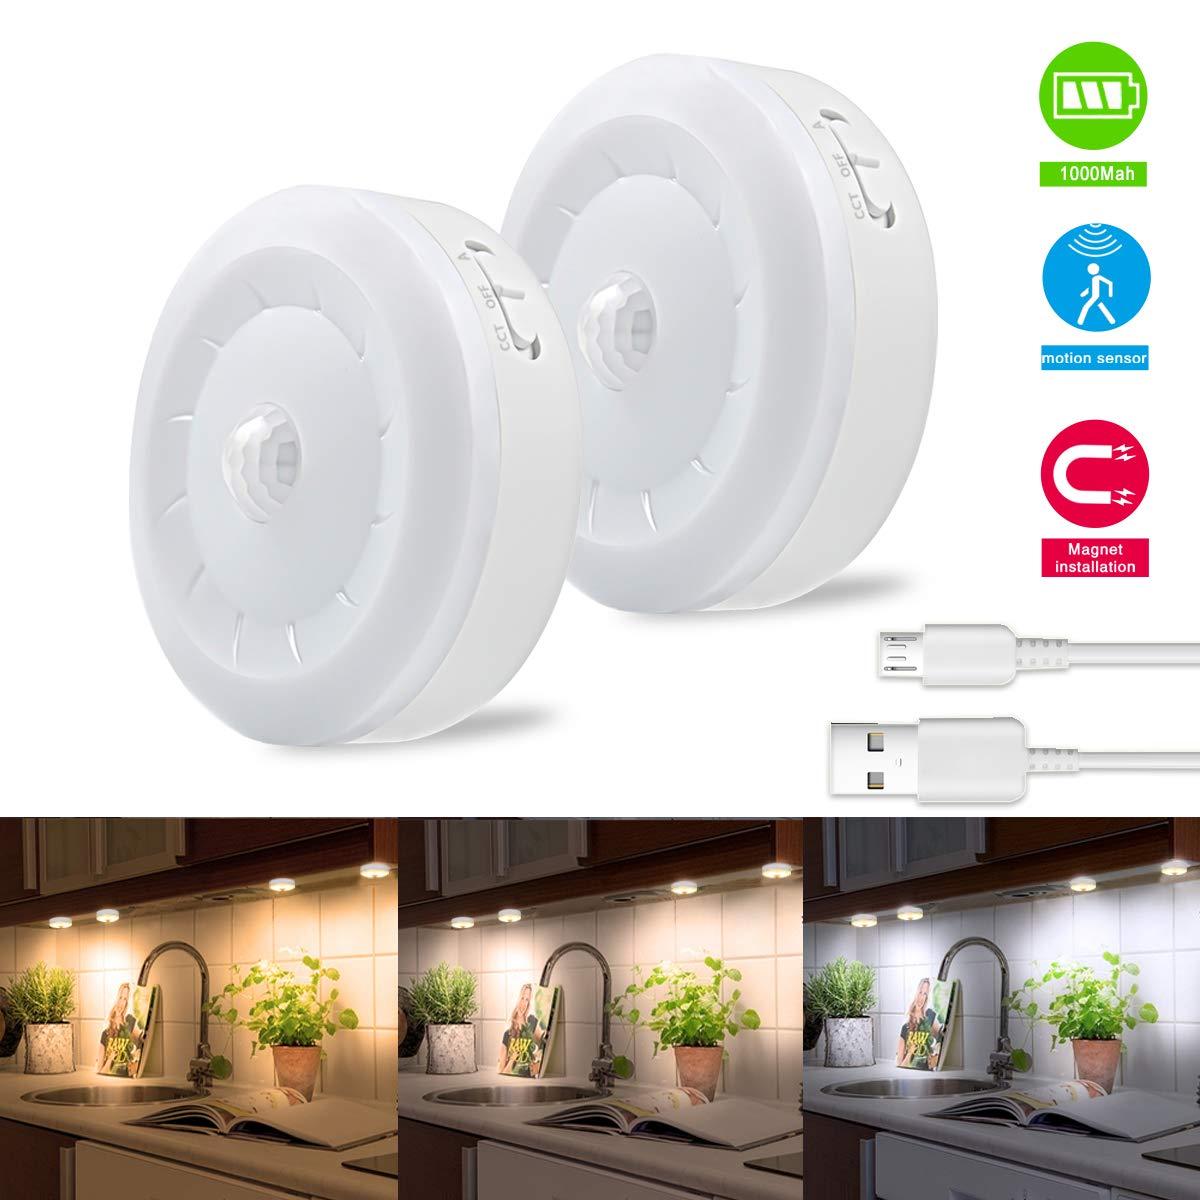 Puck Lights, Bason Motion Sensor Closet Light, 3 Color Temperature Adjustable USB Rechargeable Wireless Lighting Stick on Kitchen,Display Case,Wardrobe,2-Pack